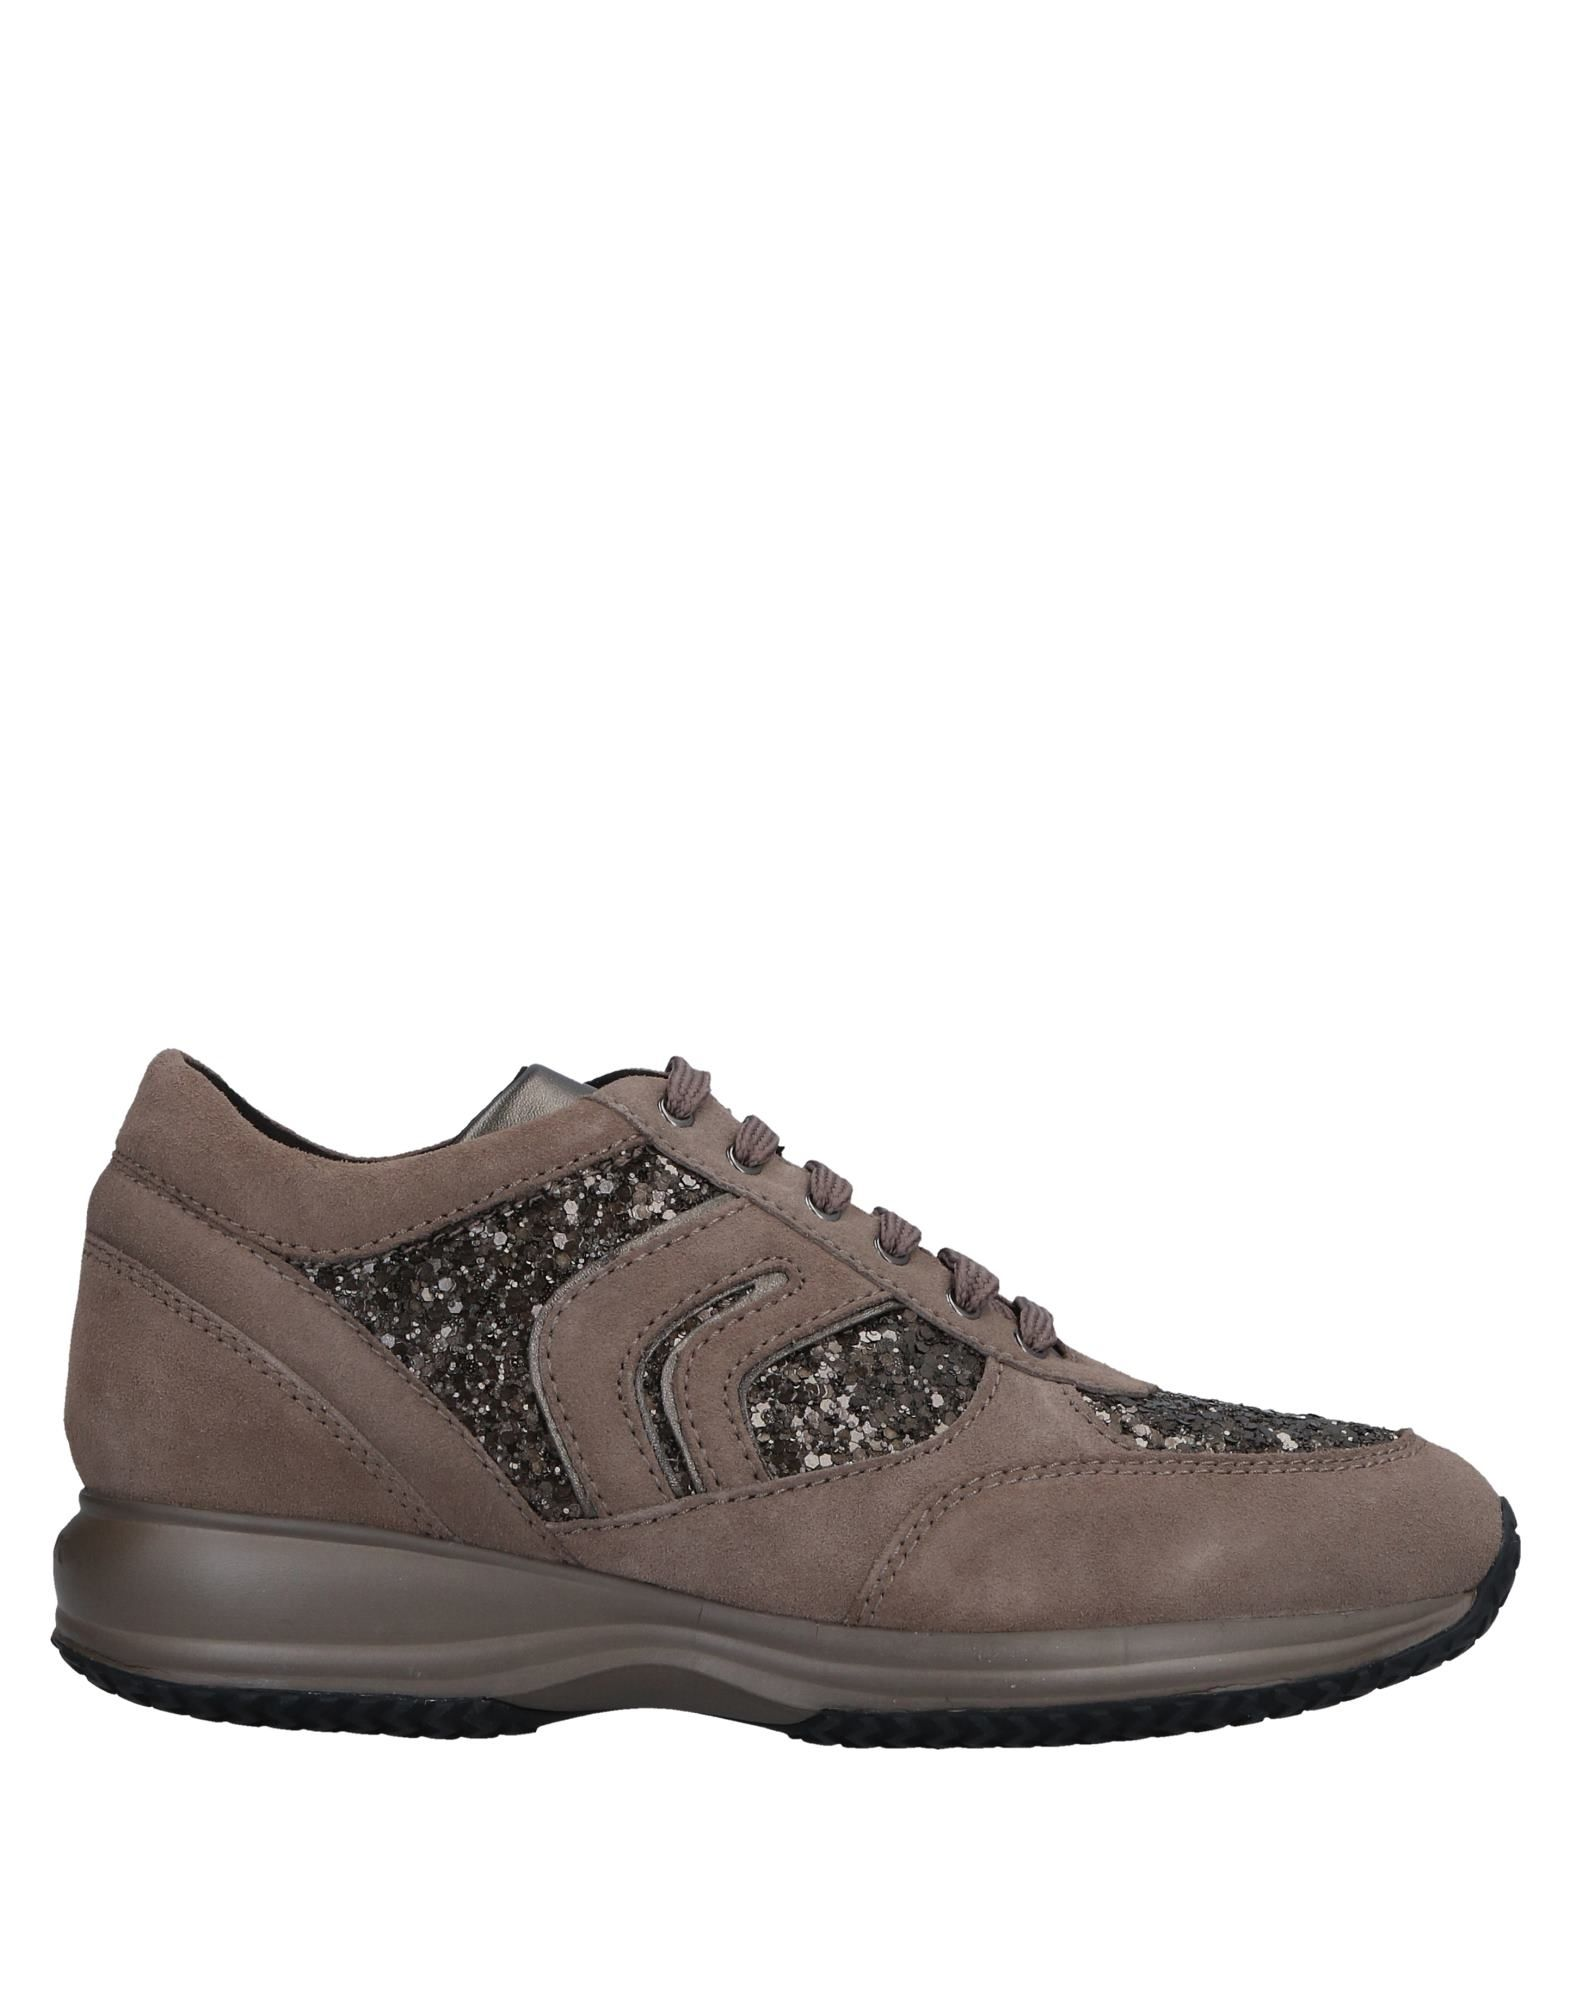 Geox Qualität Turnschuhes Damen 11520414UJ Gute Qualität Geox beliebte Schuhe d94928